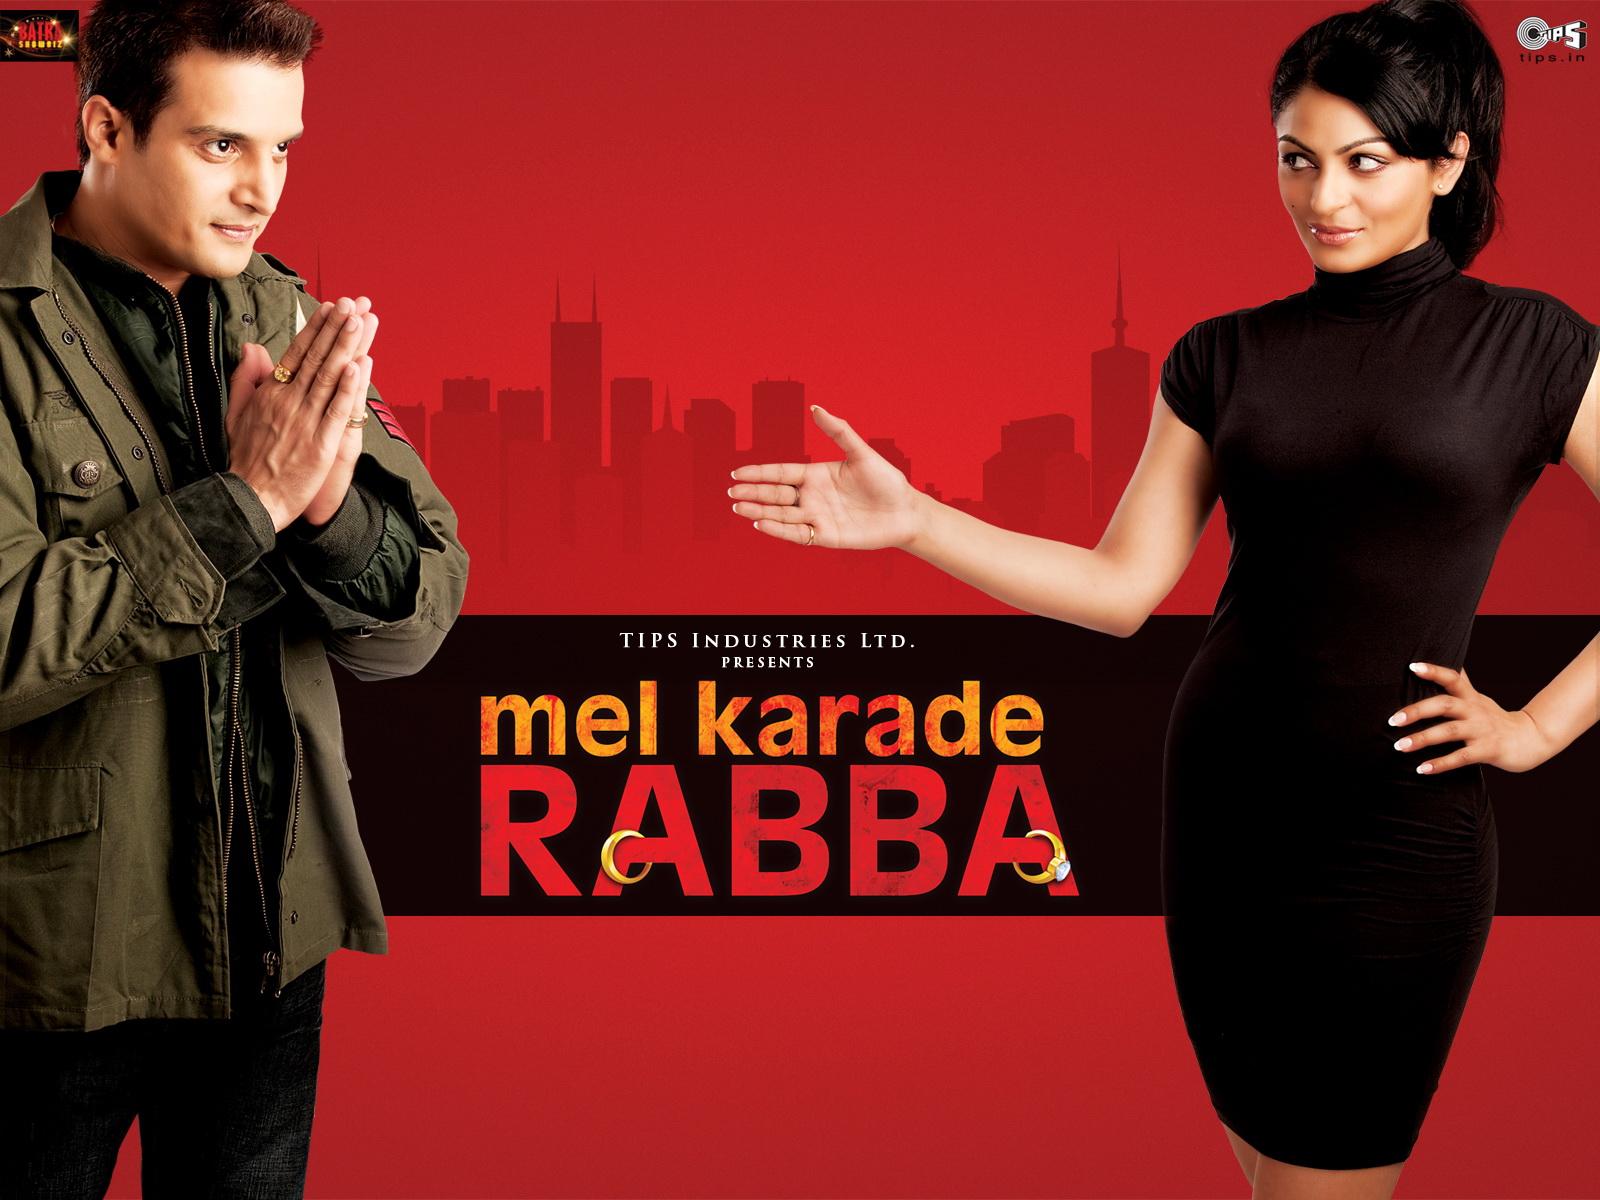 mel karade rabba movie - HD1600×1200